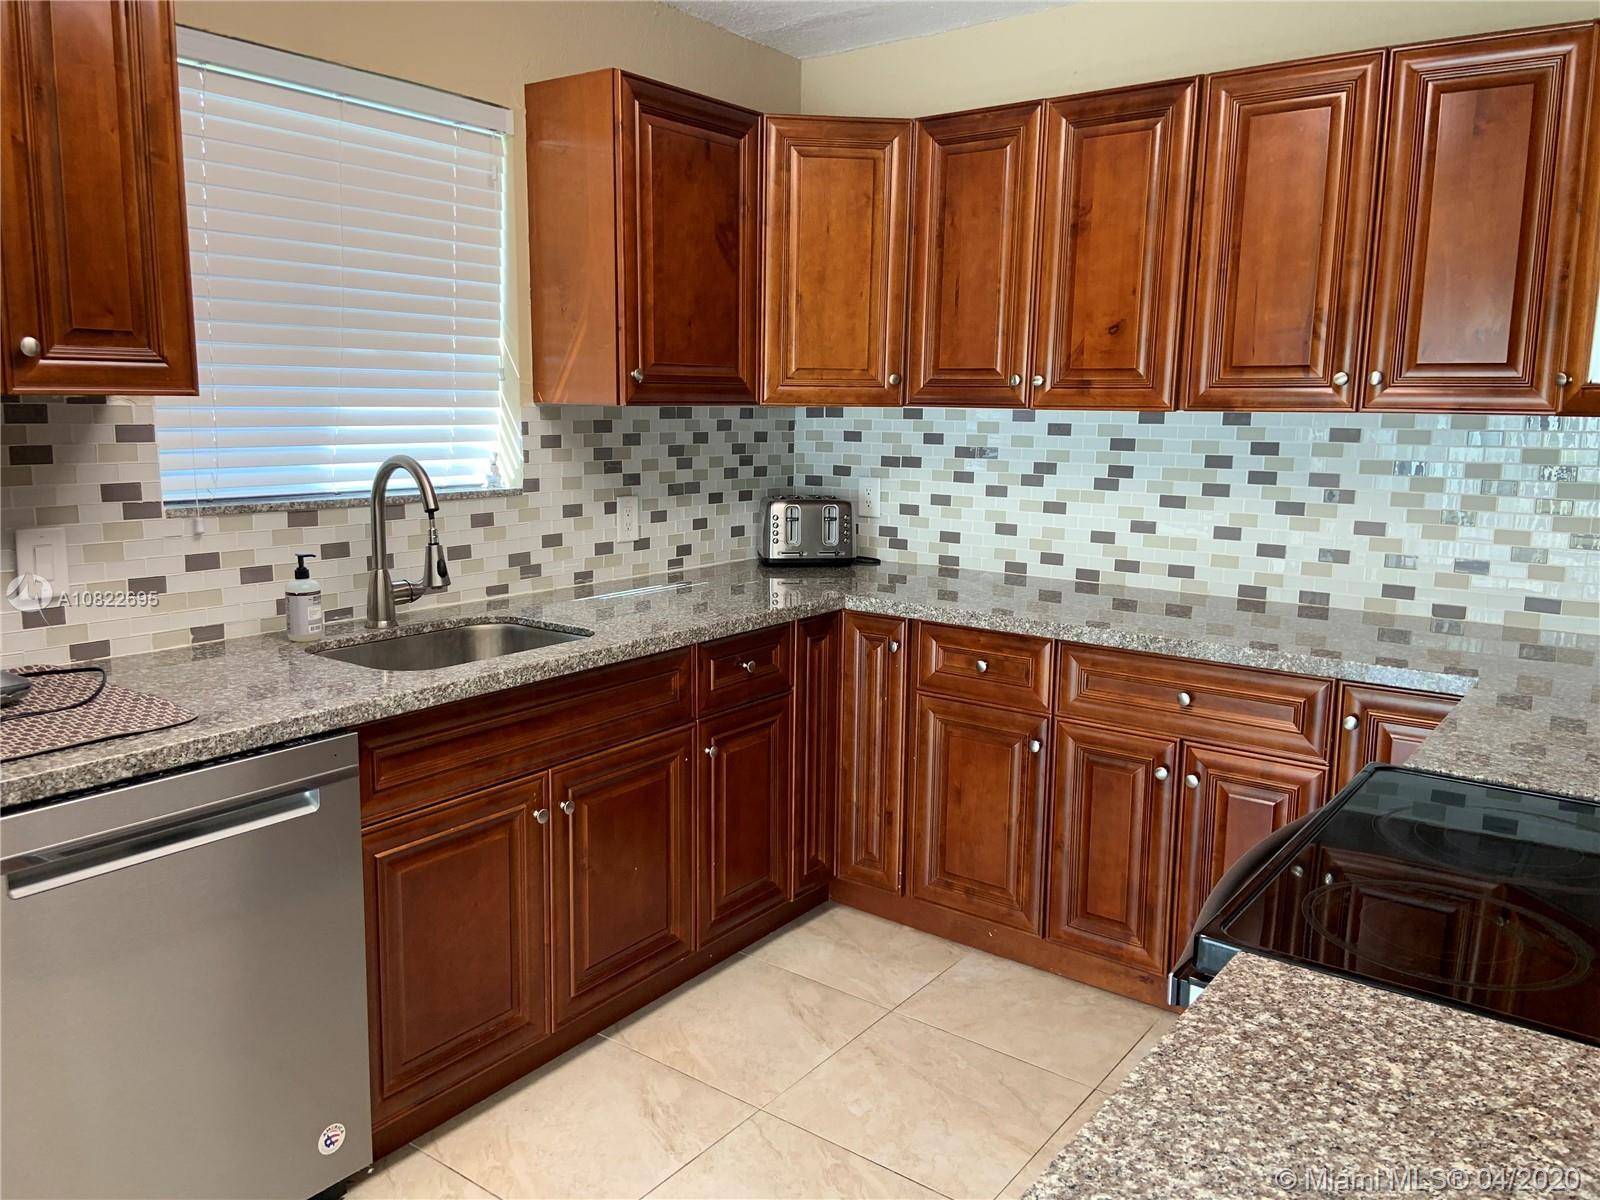 6407 SW 5th St, Pembroke Pines, FL 33023 - Pembroke Pines, FL real estate listing